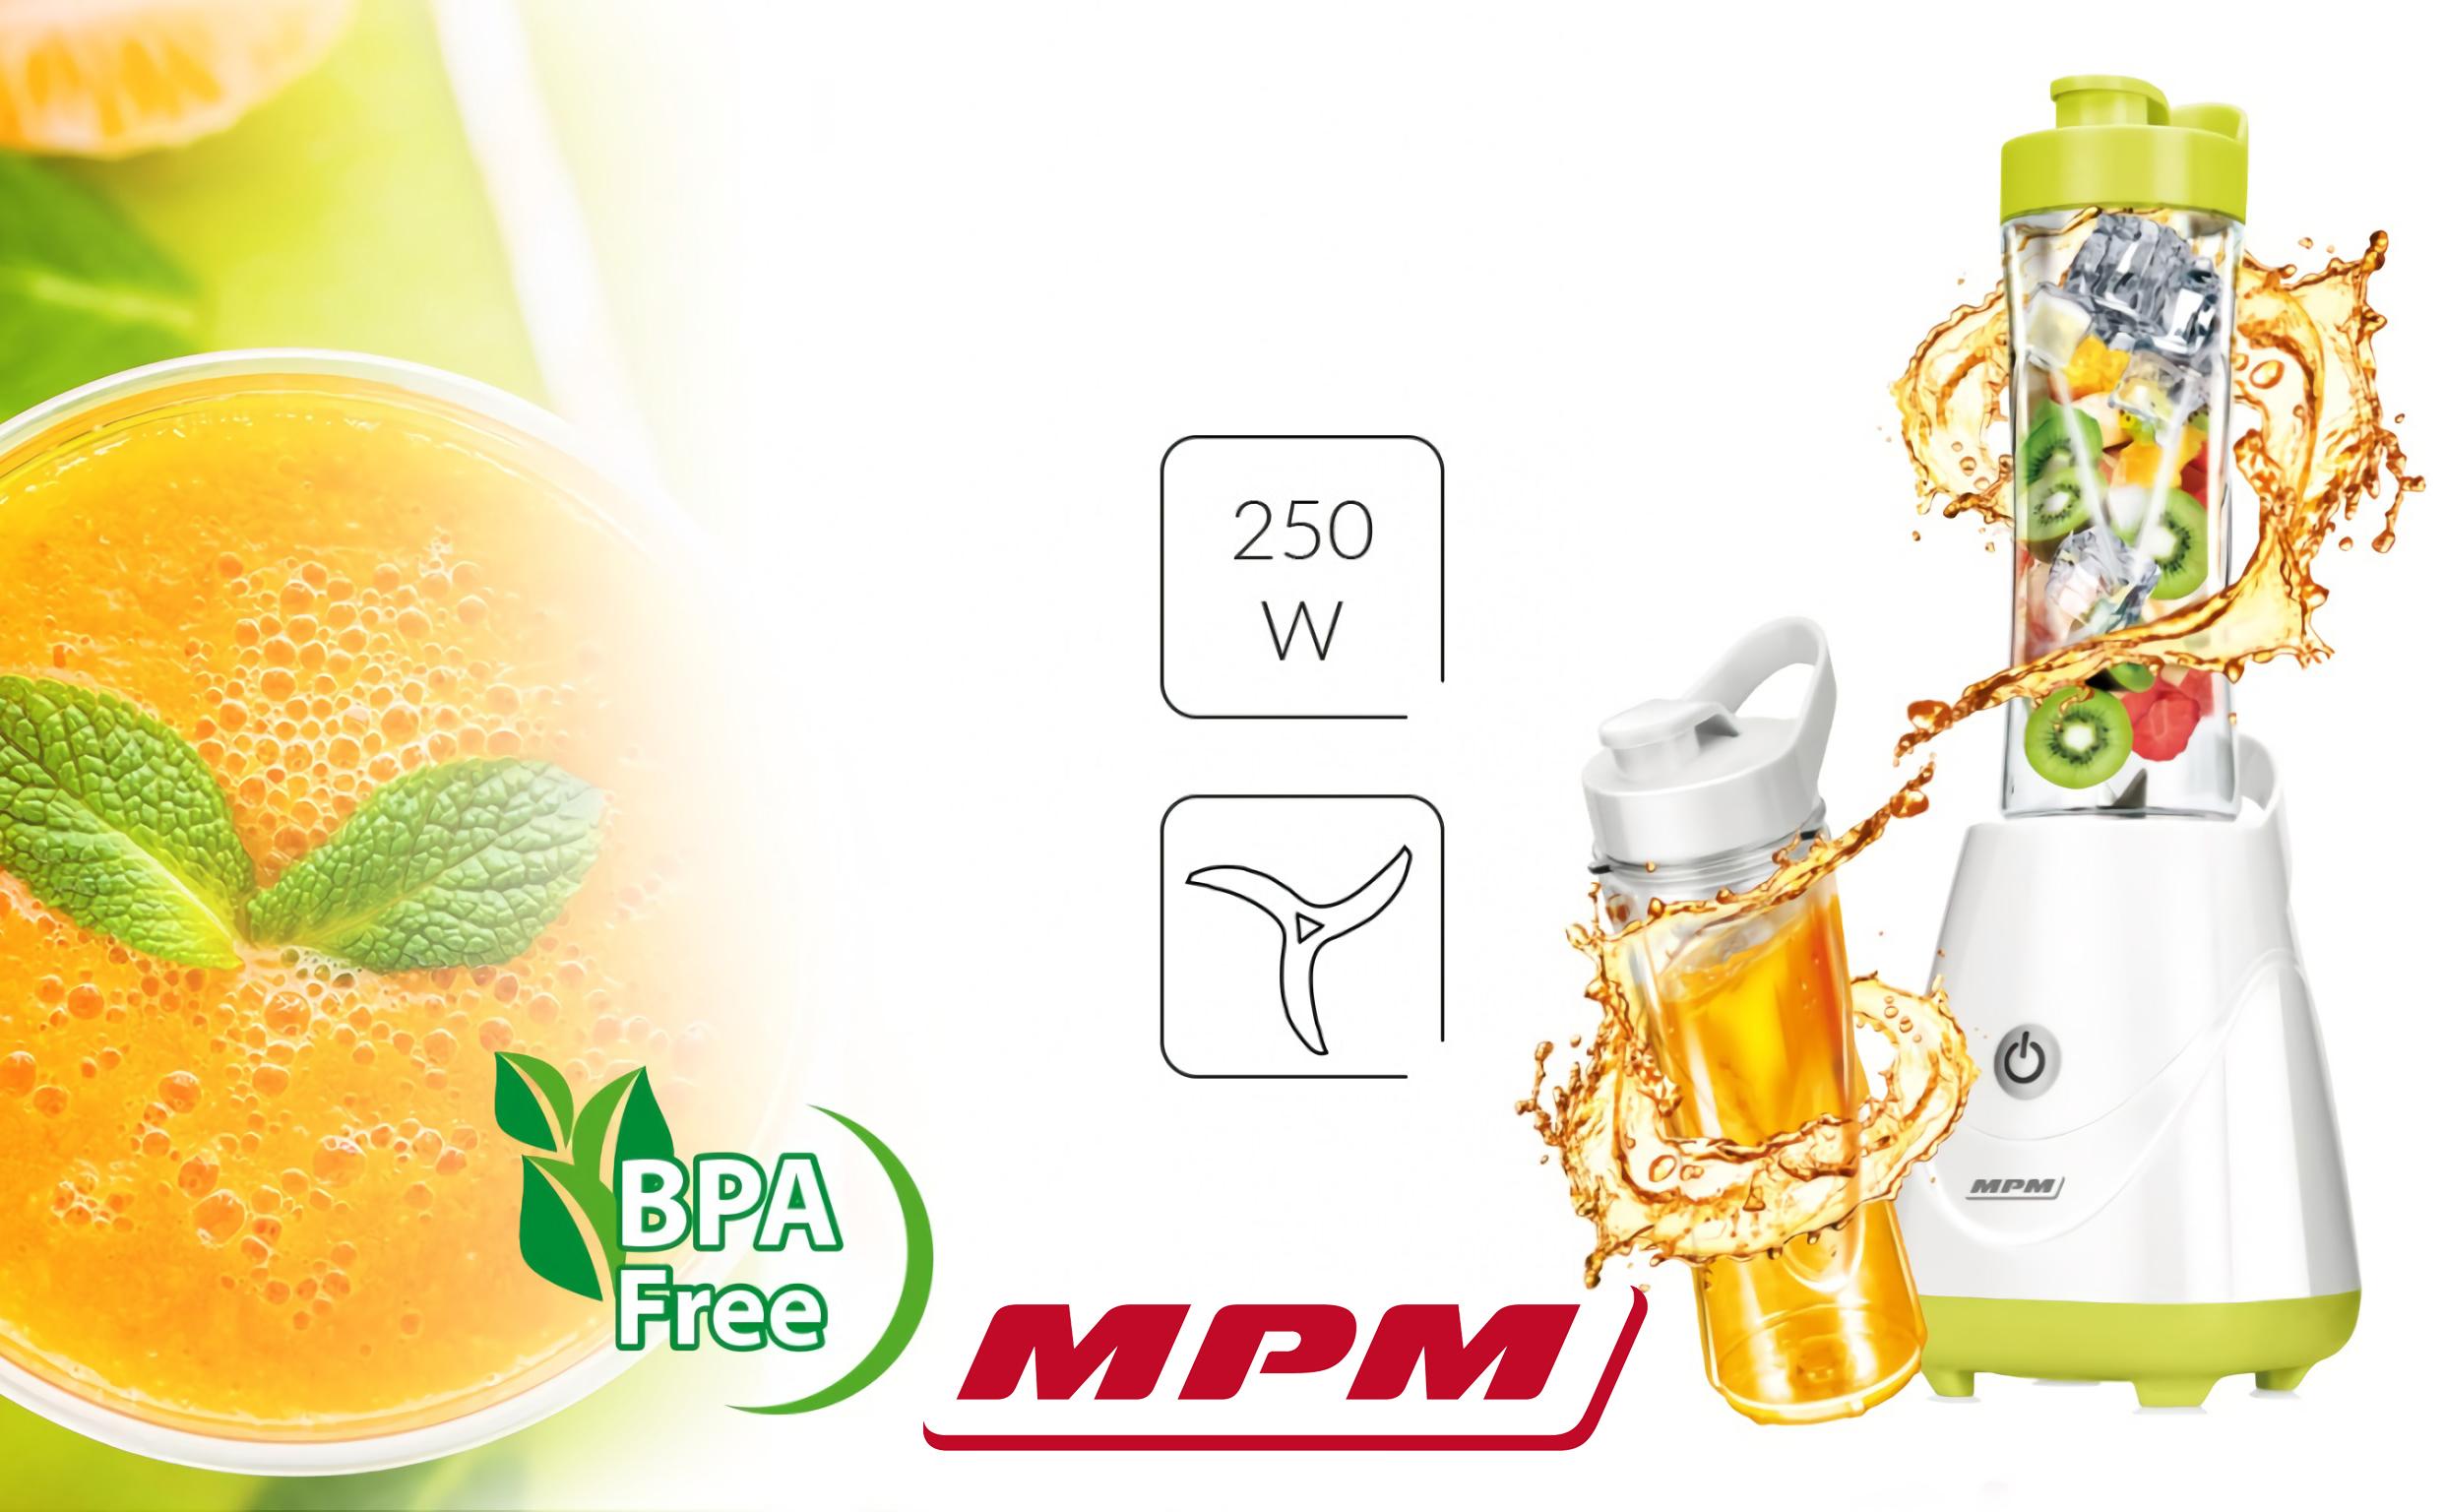 MPM MBL-20 Batidora de Vaso Good To Go, Licuadora Personal con 2 Botellas de 600 ml, Smothie, 250W, Libre de BPA